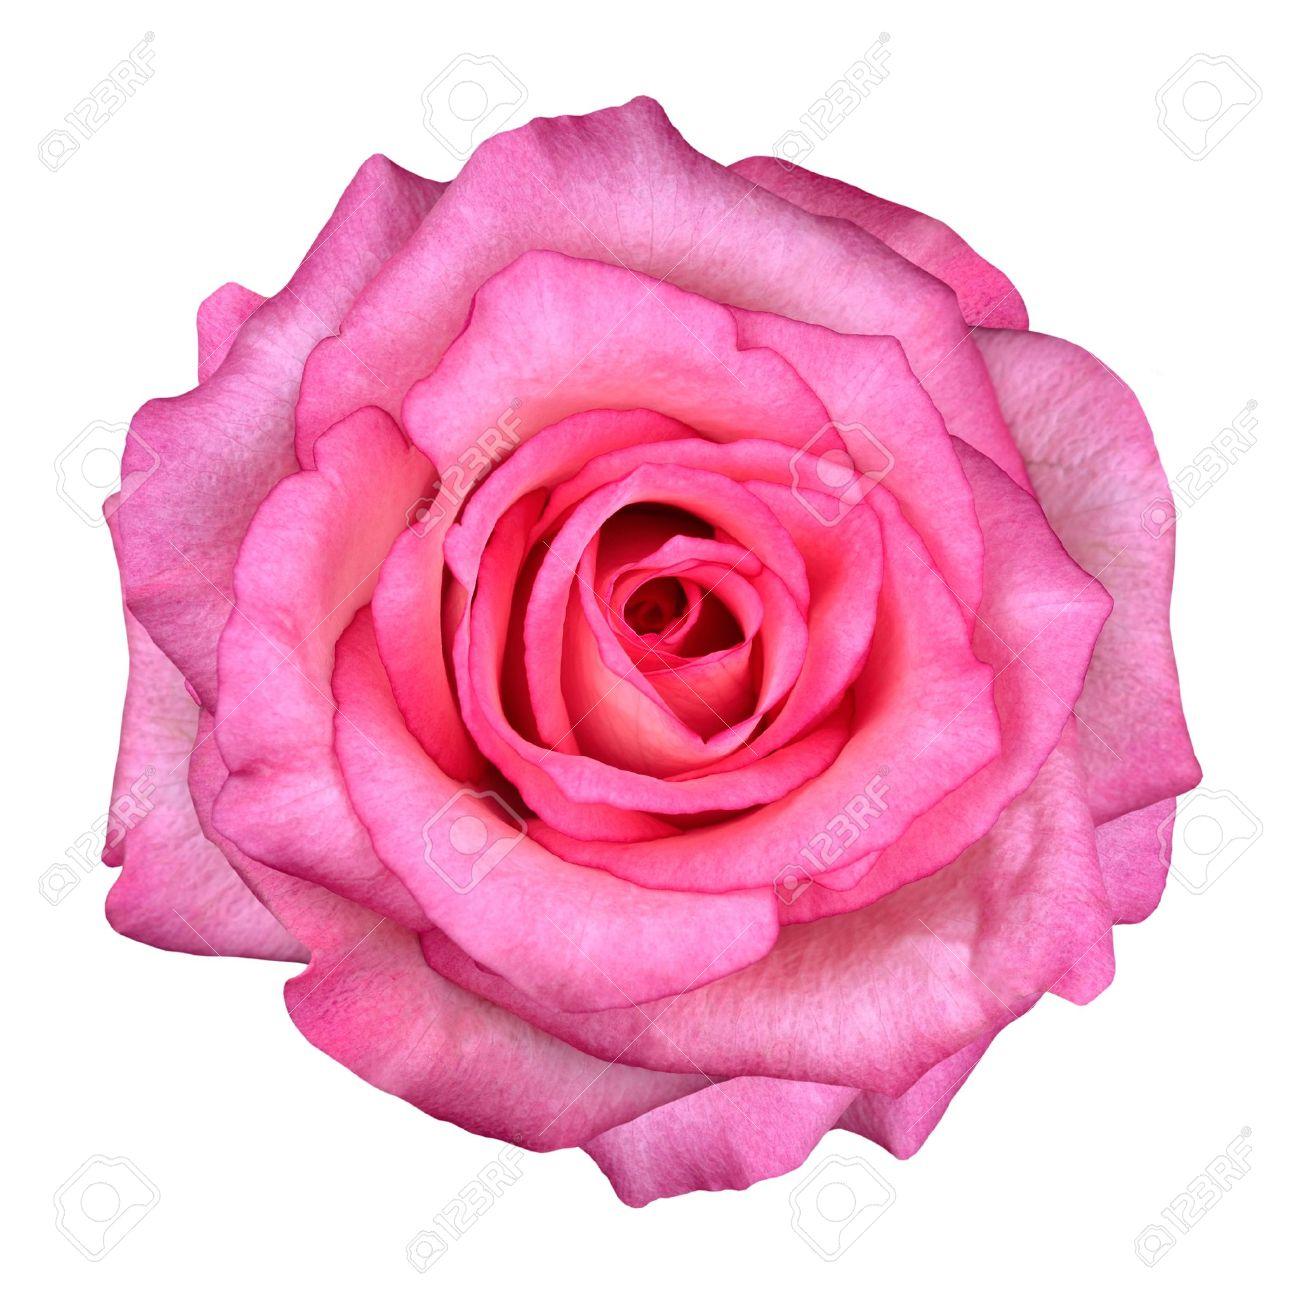 Pink rose flower isolated on white background top view on beautiful pink rose flower isolated on white background top view on beautiful pink rose flower stock mightylinksfo